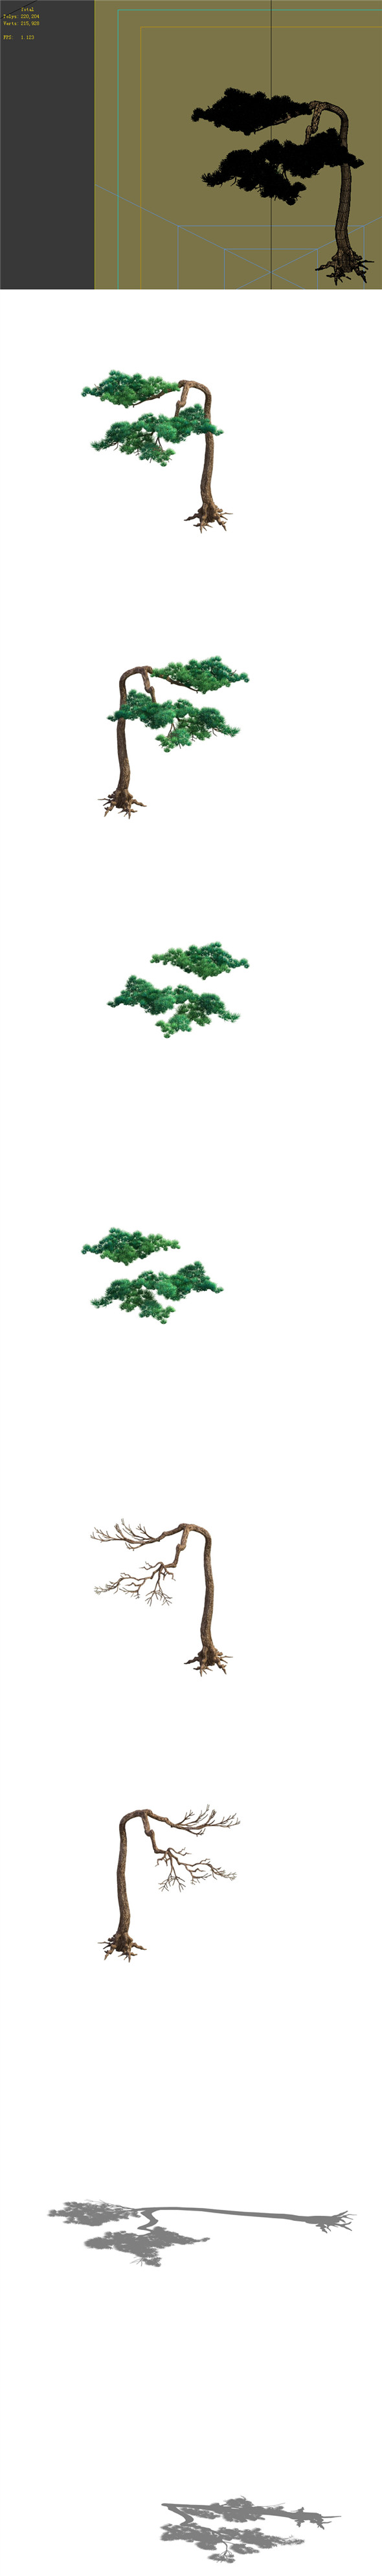 Game Model - Taoist comprehension scene - Pine 09 01 - 3DOcean Item for Sale